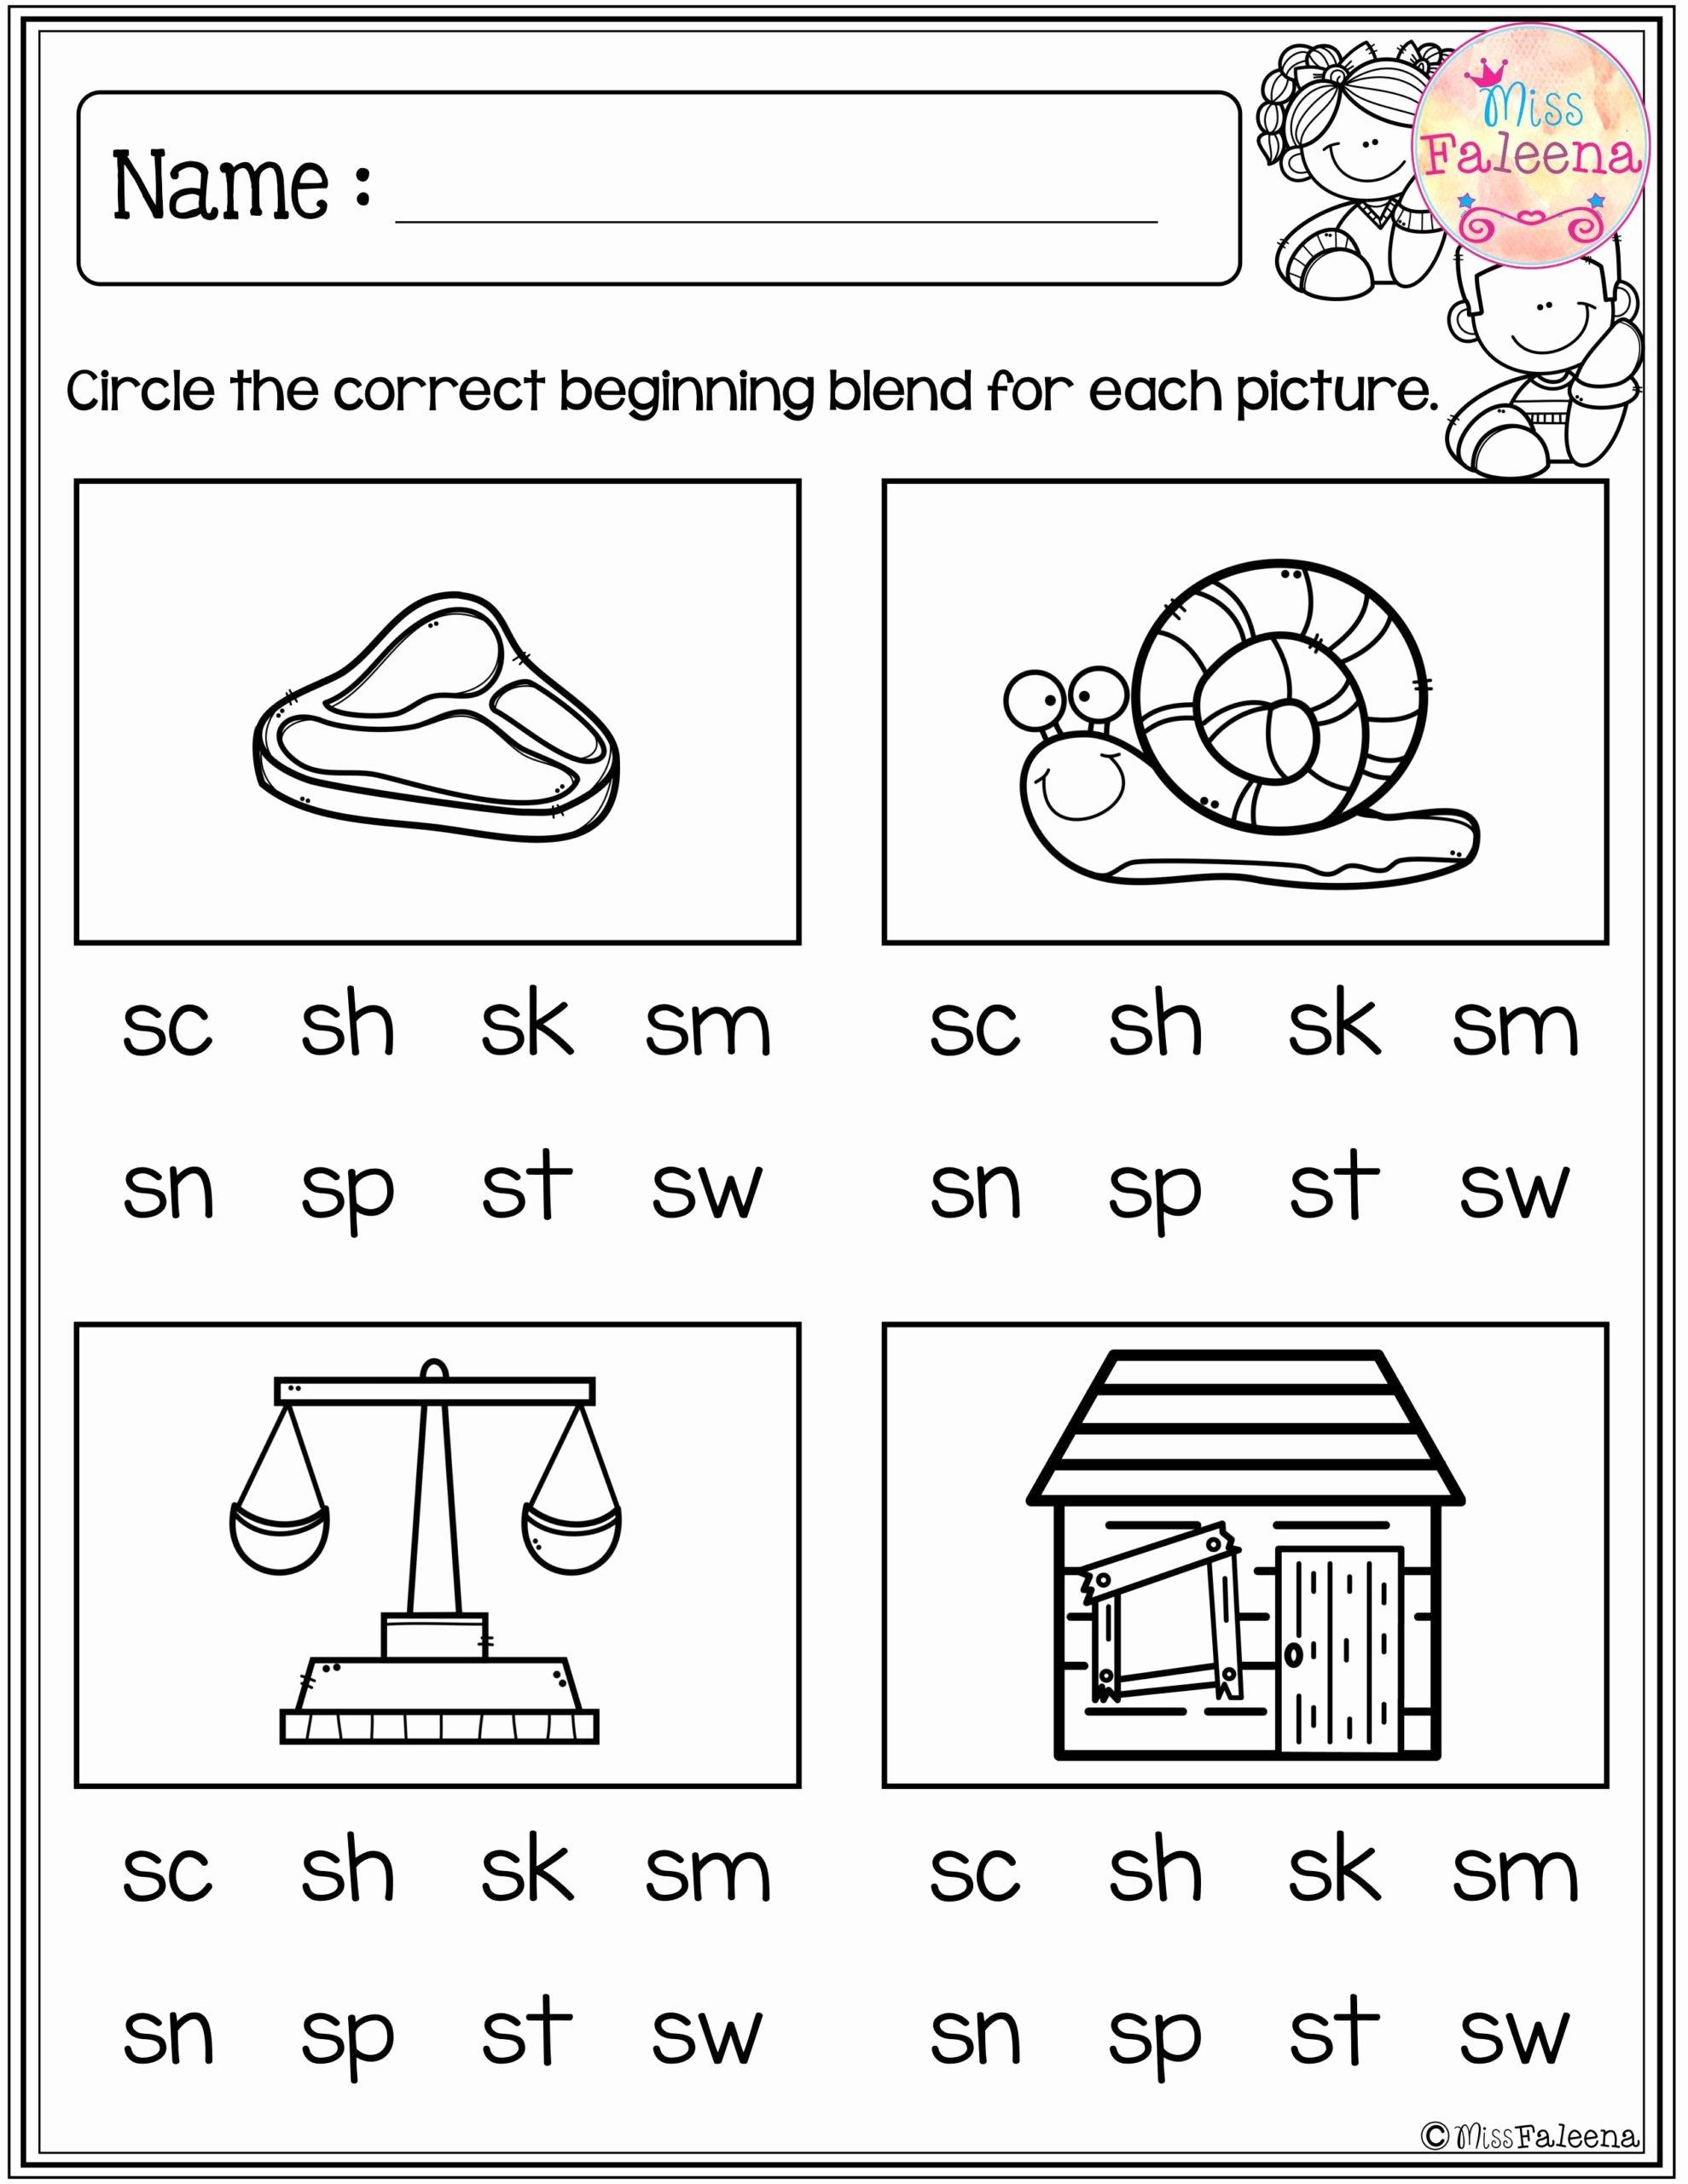 Worksheets for Preschoolers Learning English New Worksheet Life Cycle Plant Worksheet for Kindergarten